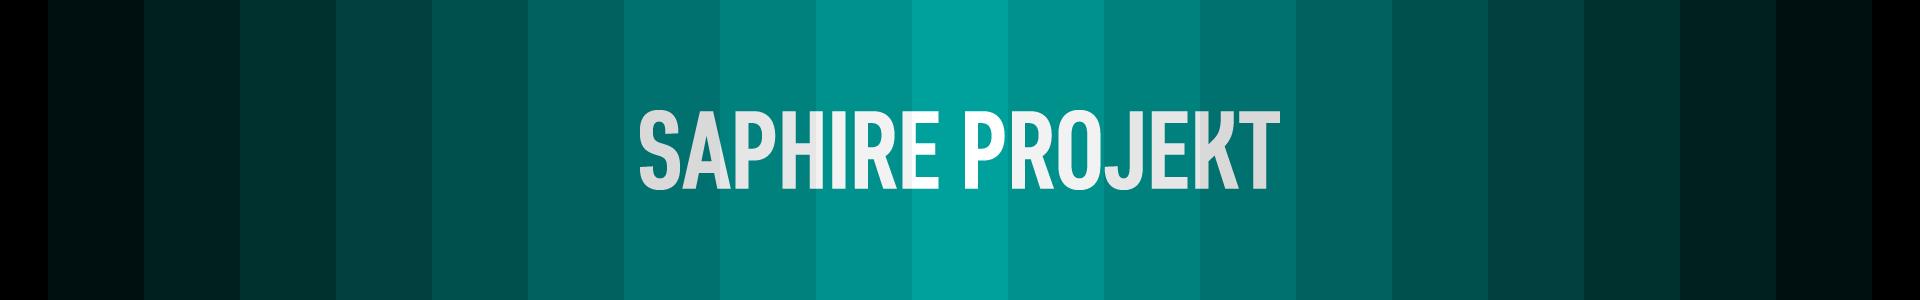 Saphireprojekt